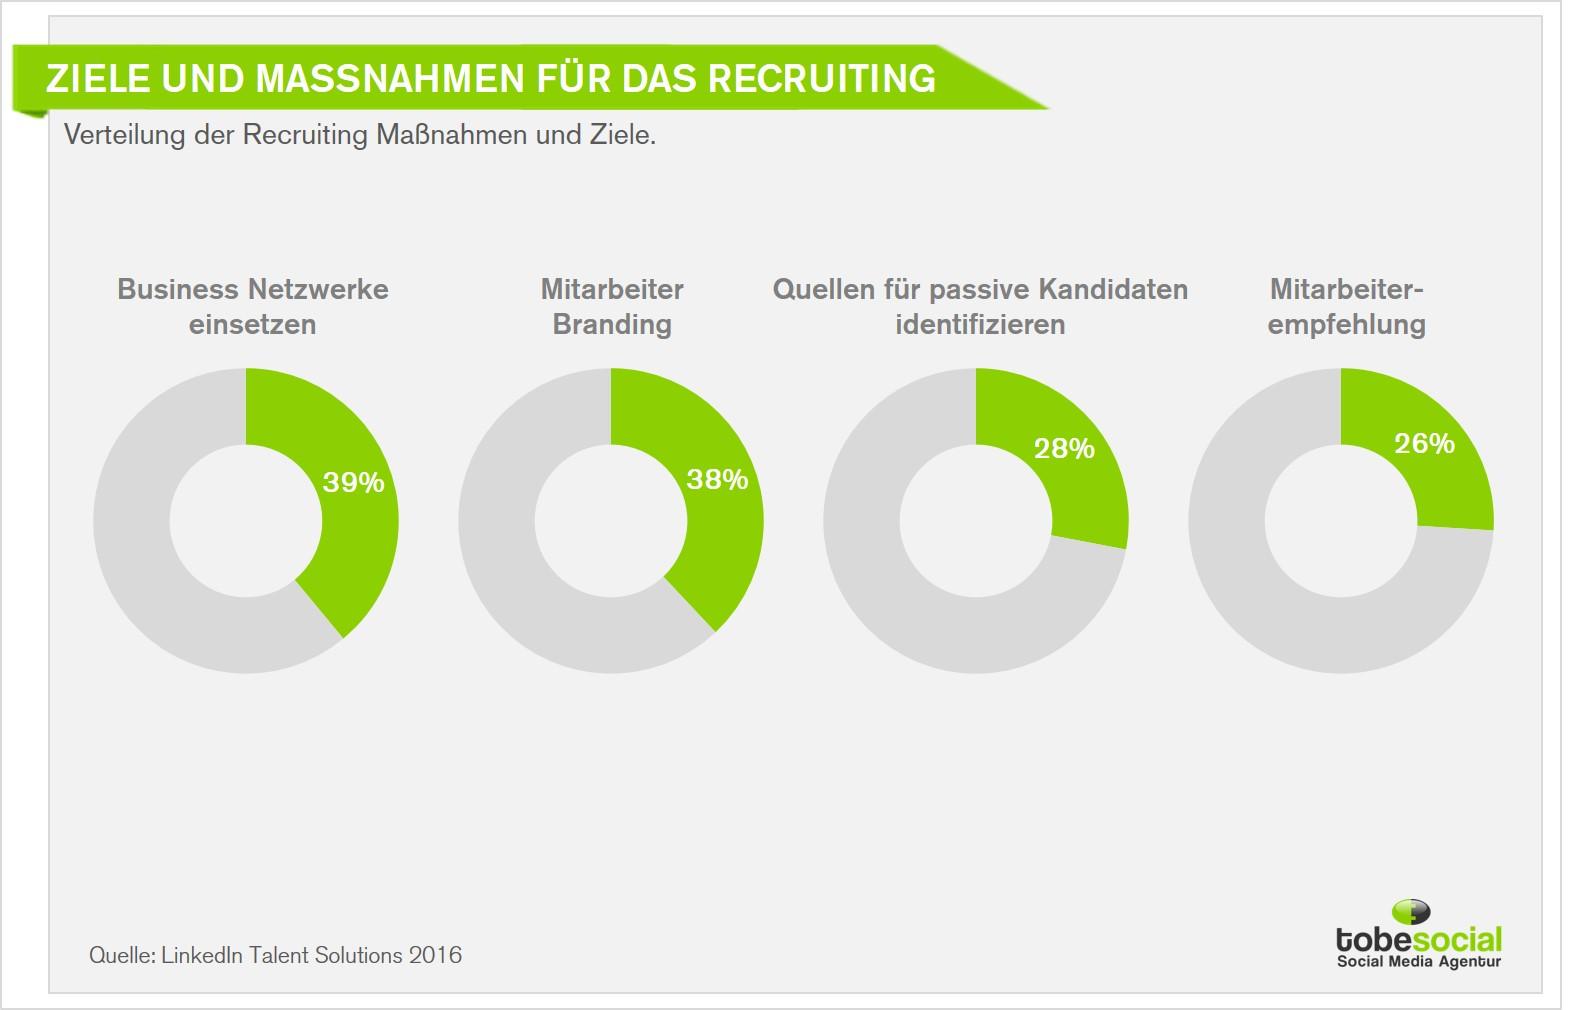 Global Social Recruiting Trends 2016 Wie Entwickelt Sich Das